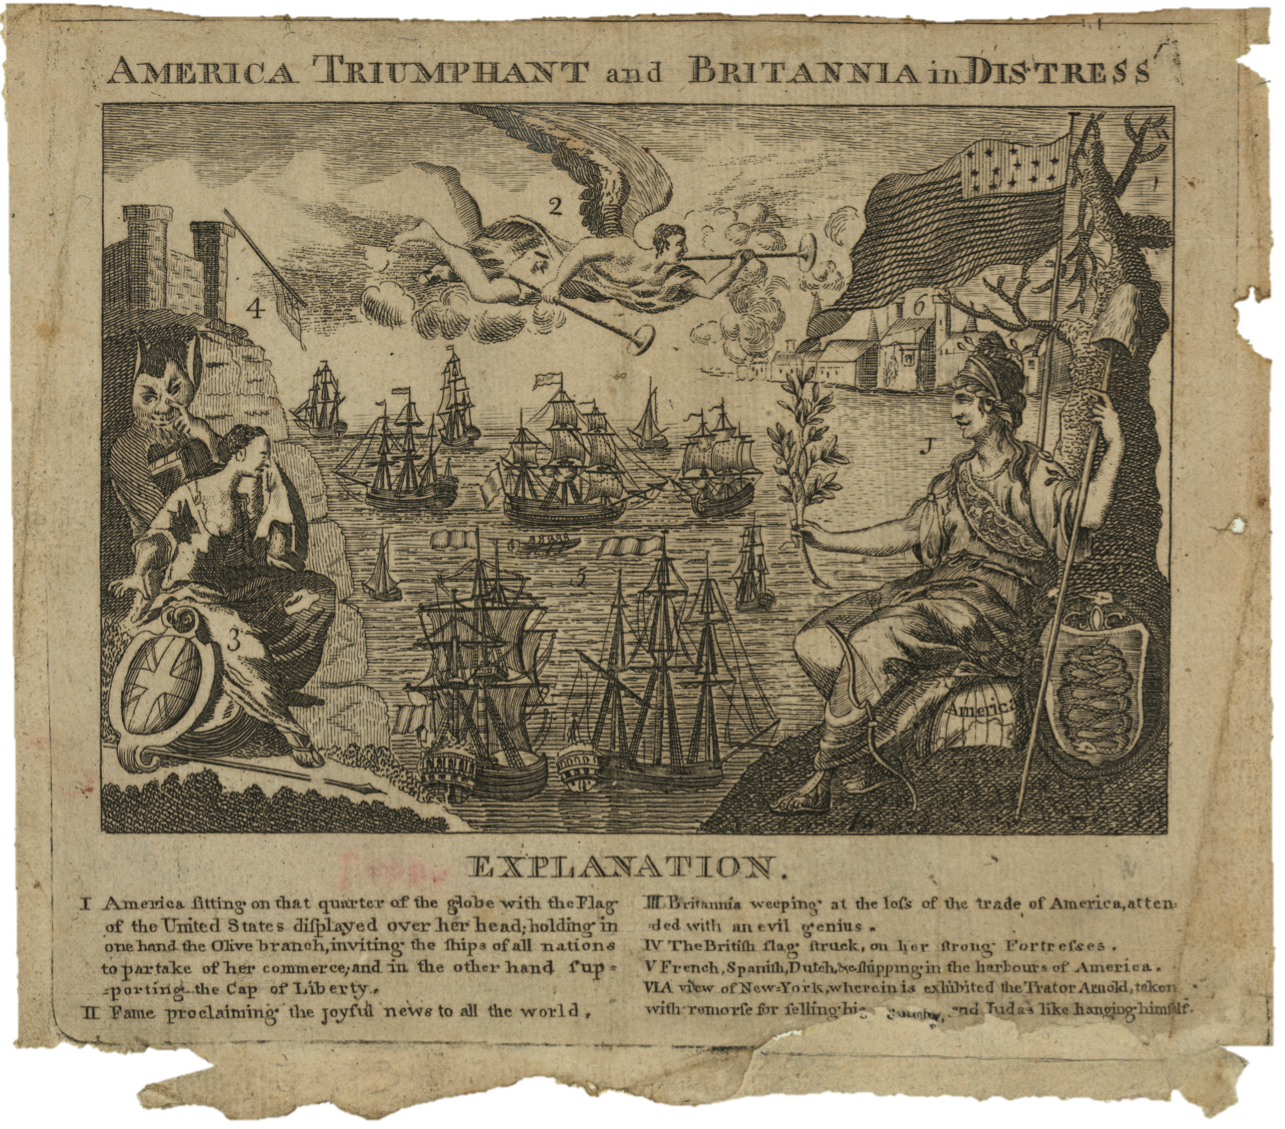 America Triumphant and Britannia in Distress, American Revolutionary War, 1782, Boston, American War of Independence, American War